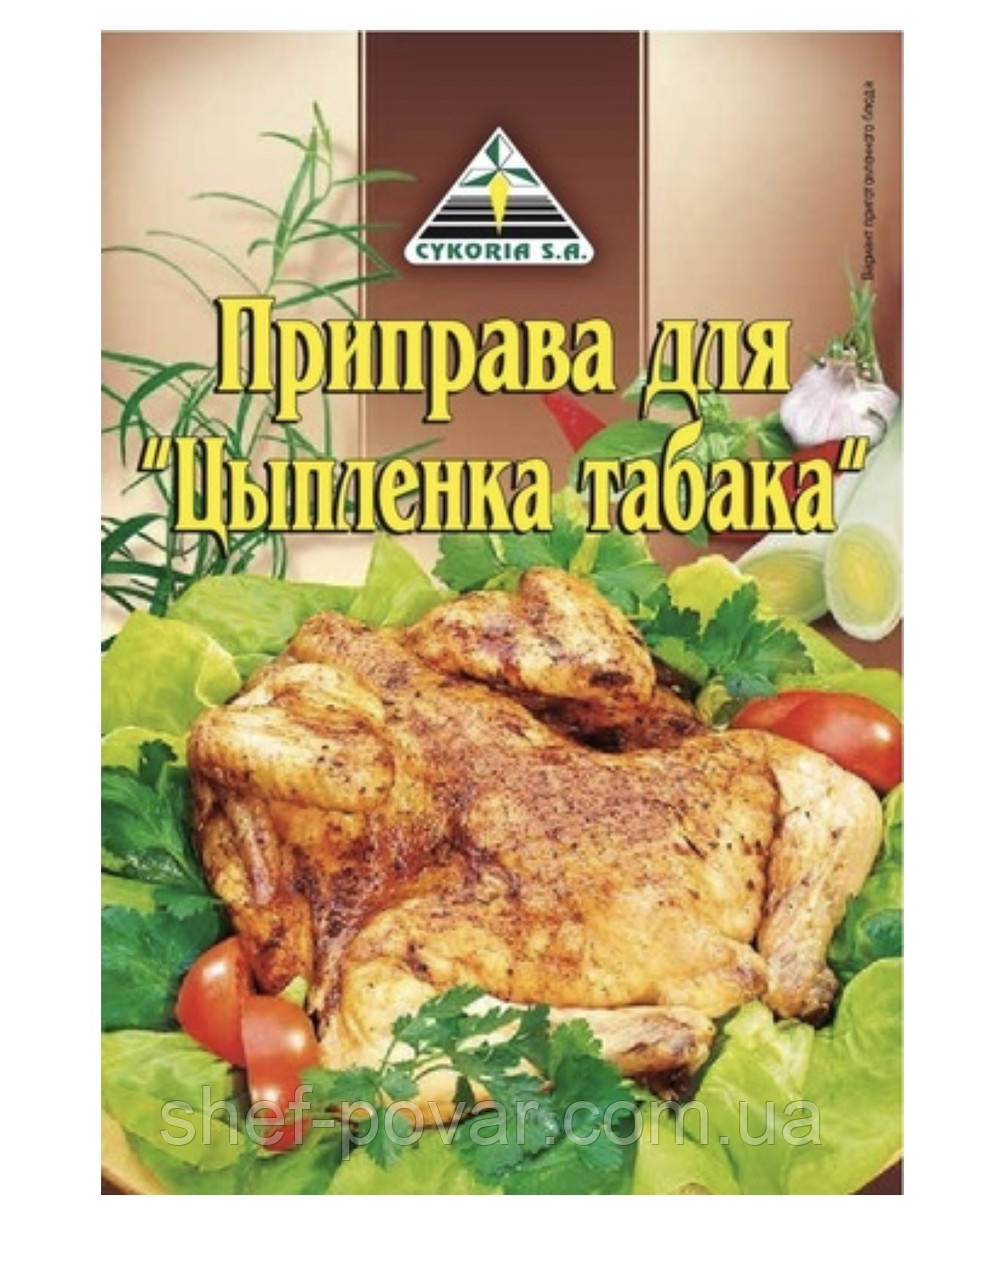 Приправа для «Цыплёнка табака» 40гр  ТМ «Cykoria s. a.»